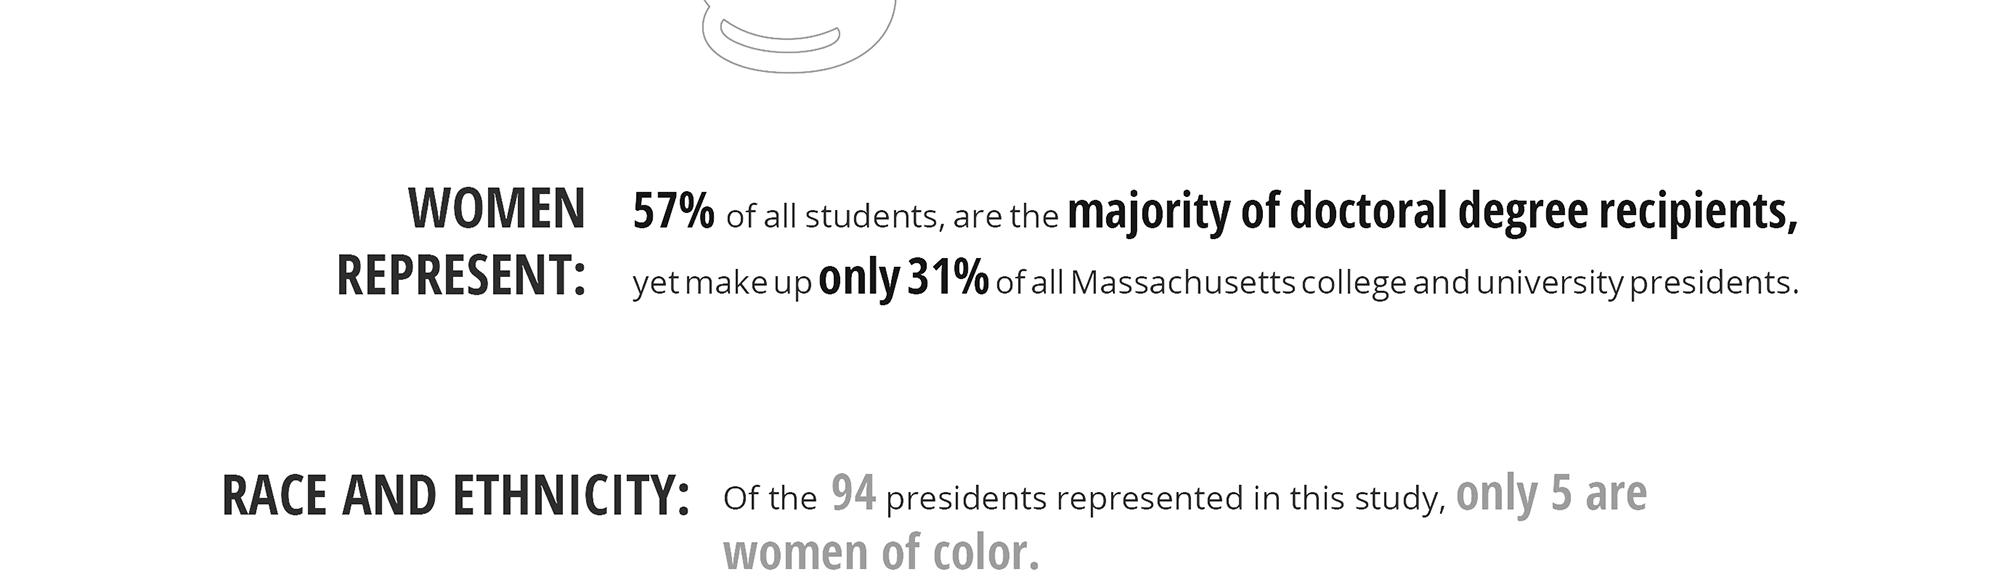 Key Leadership Statistics: Higher Education in Massachusetts